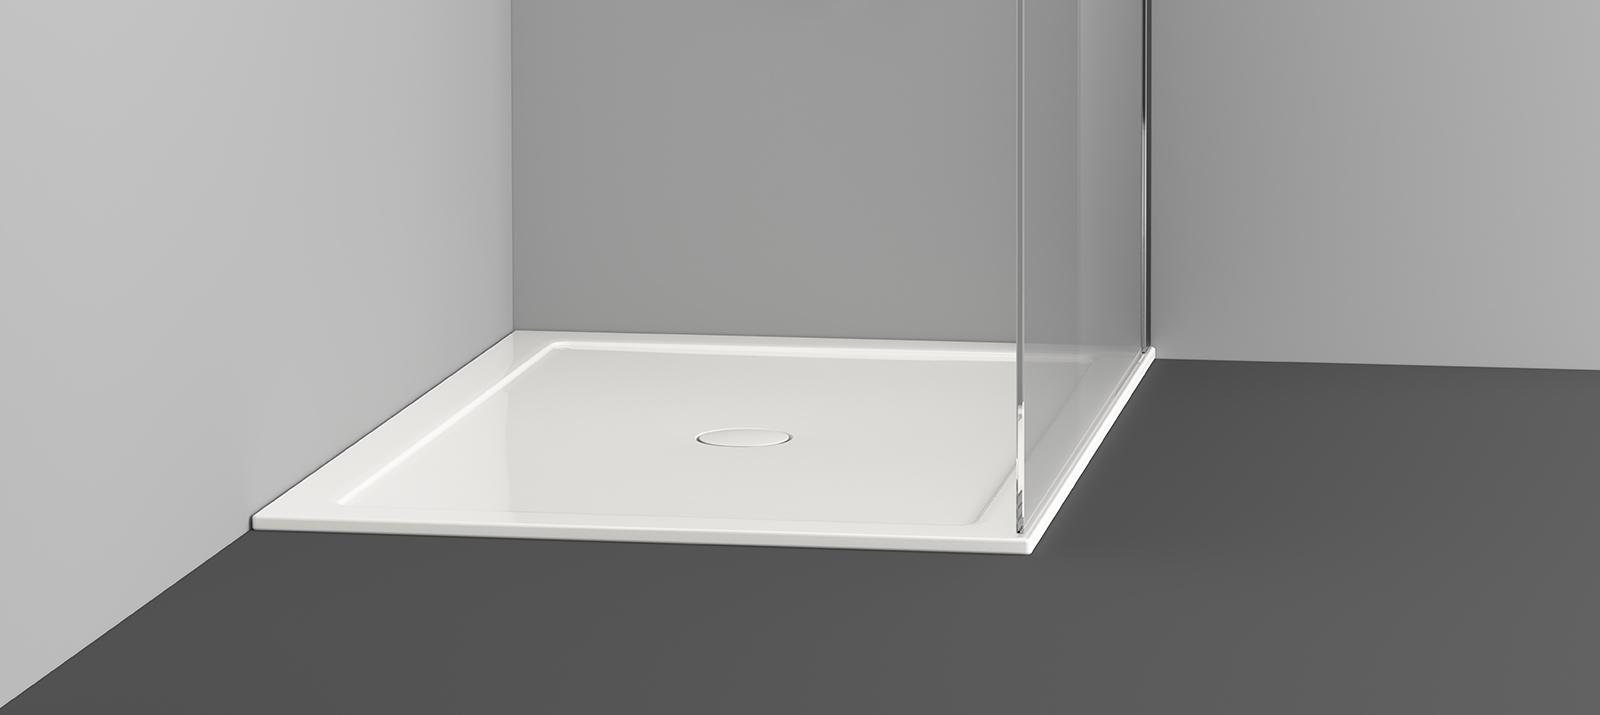 schmidlin contura duschwanne. Black Bedroom Furniture Sets. Home Design Ideas